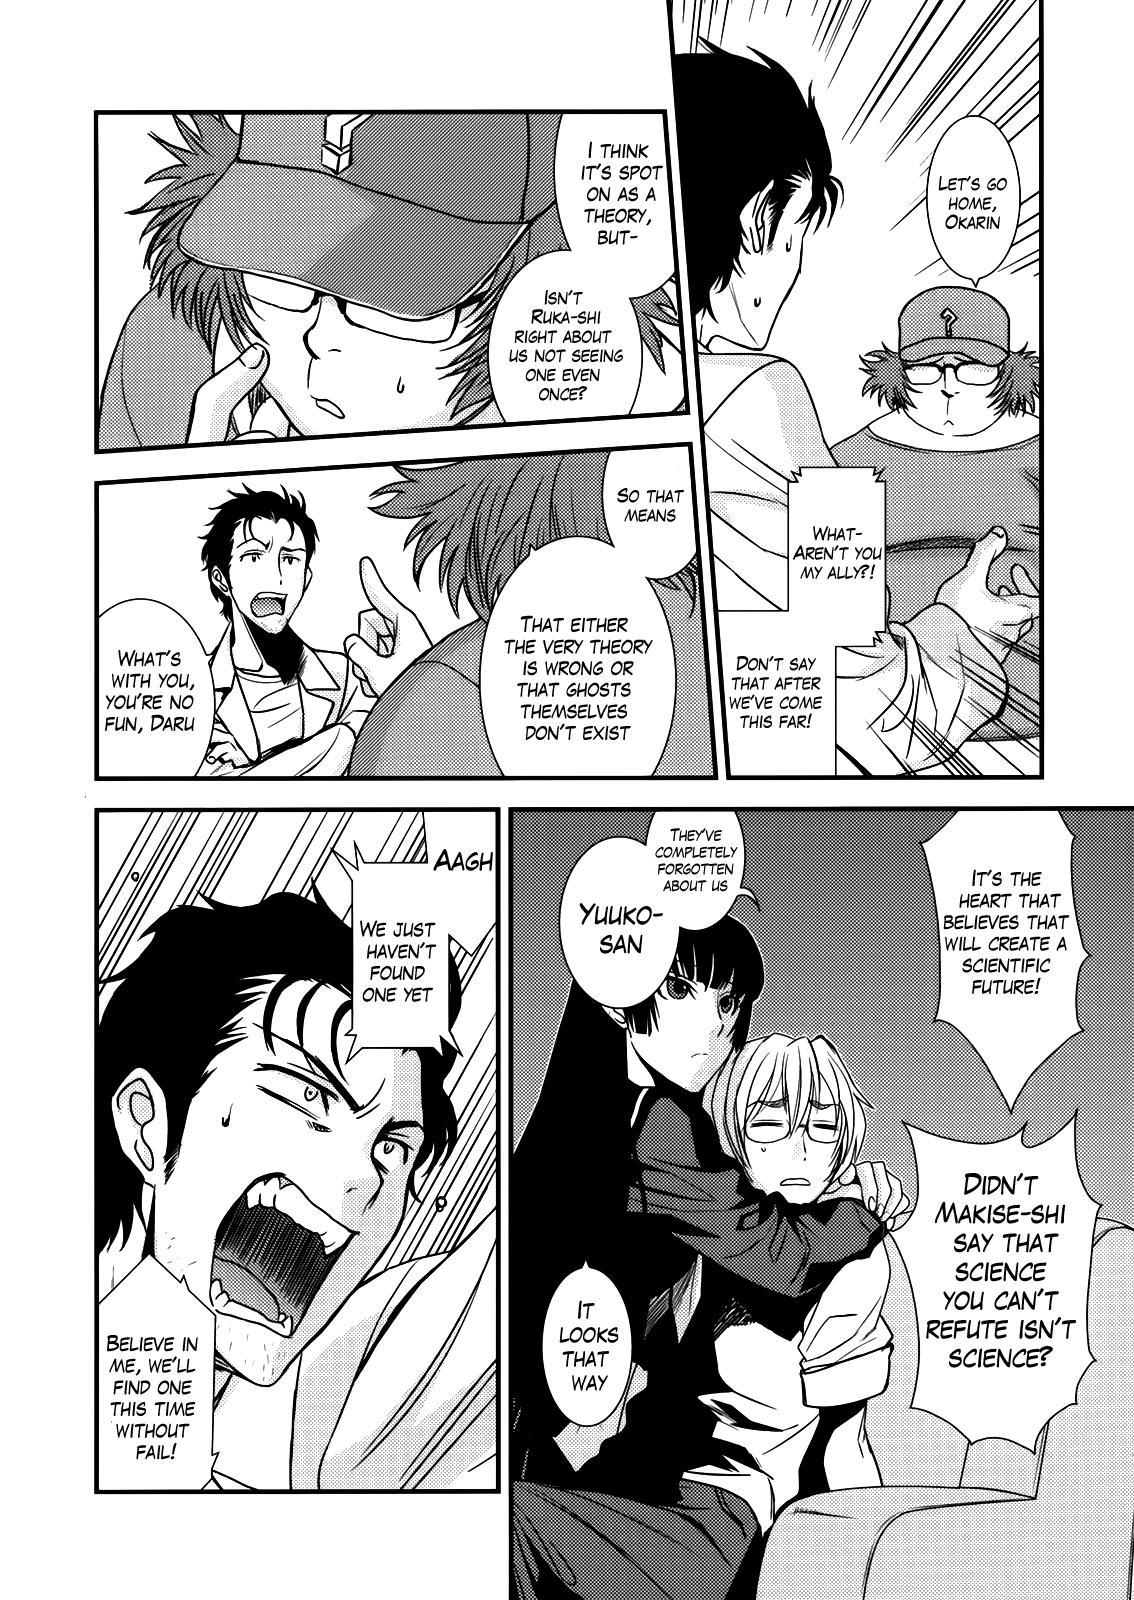 Hontou ni Atta Kowai Hanashi   It Really Was There! A Scary Story 6